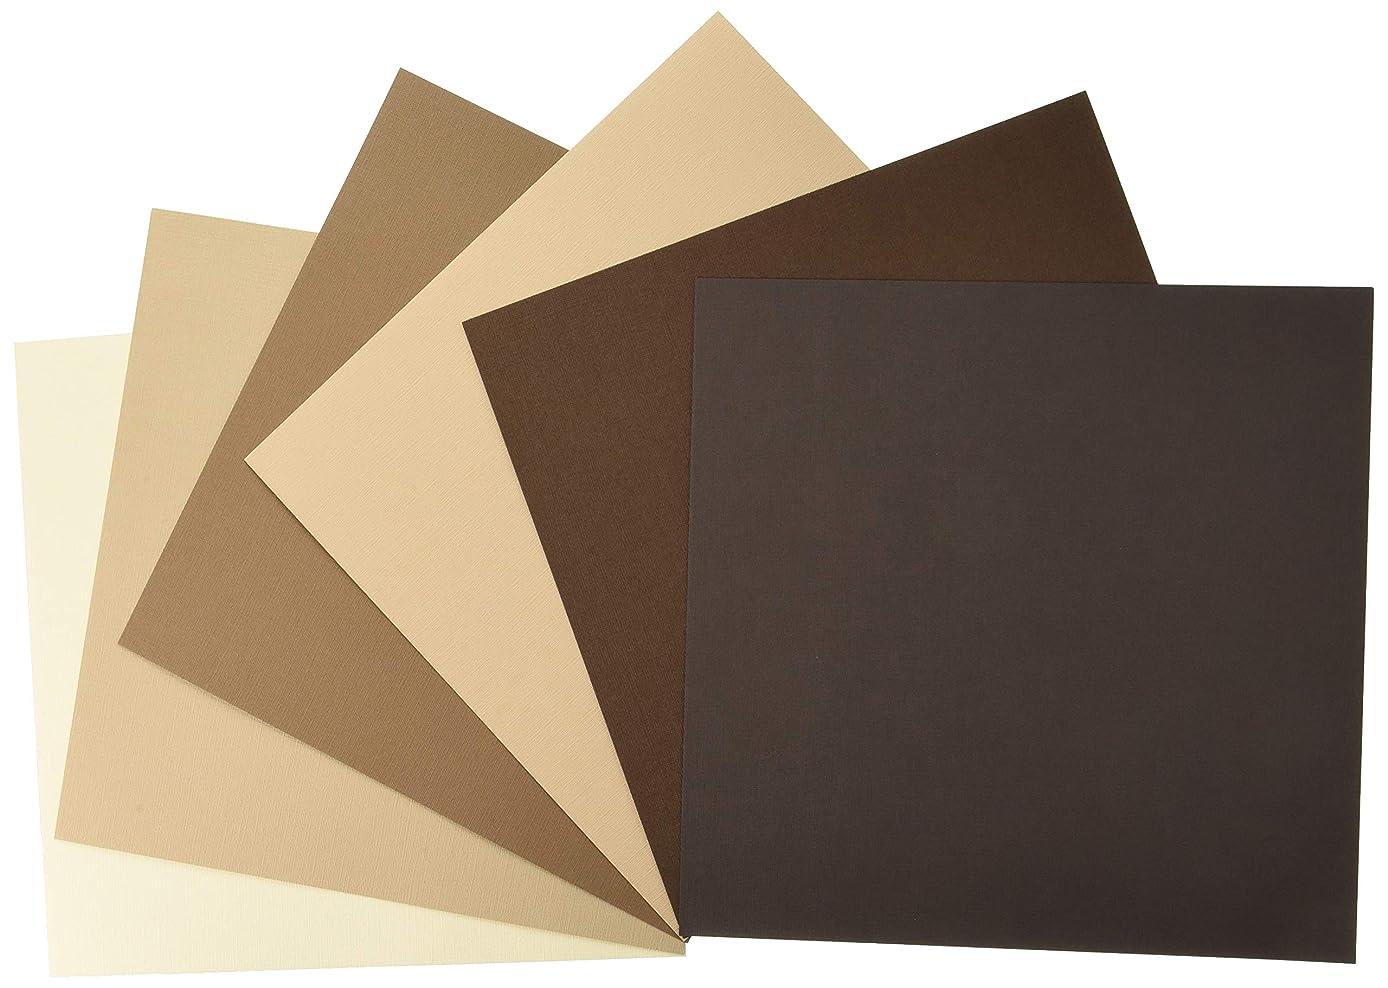 My Colors 210035 Brown Tones Canvas Cardstock Bundle (18 Pack), 12